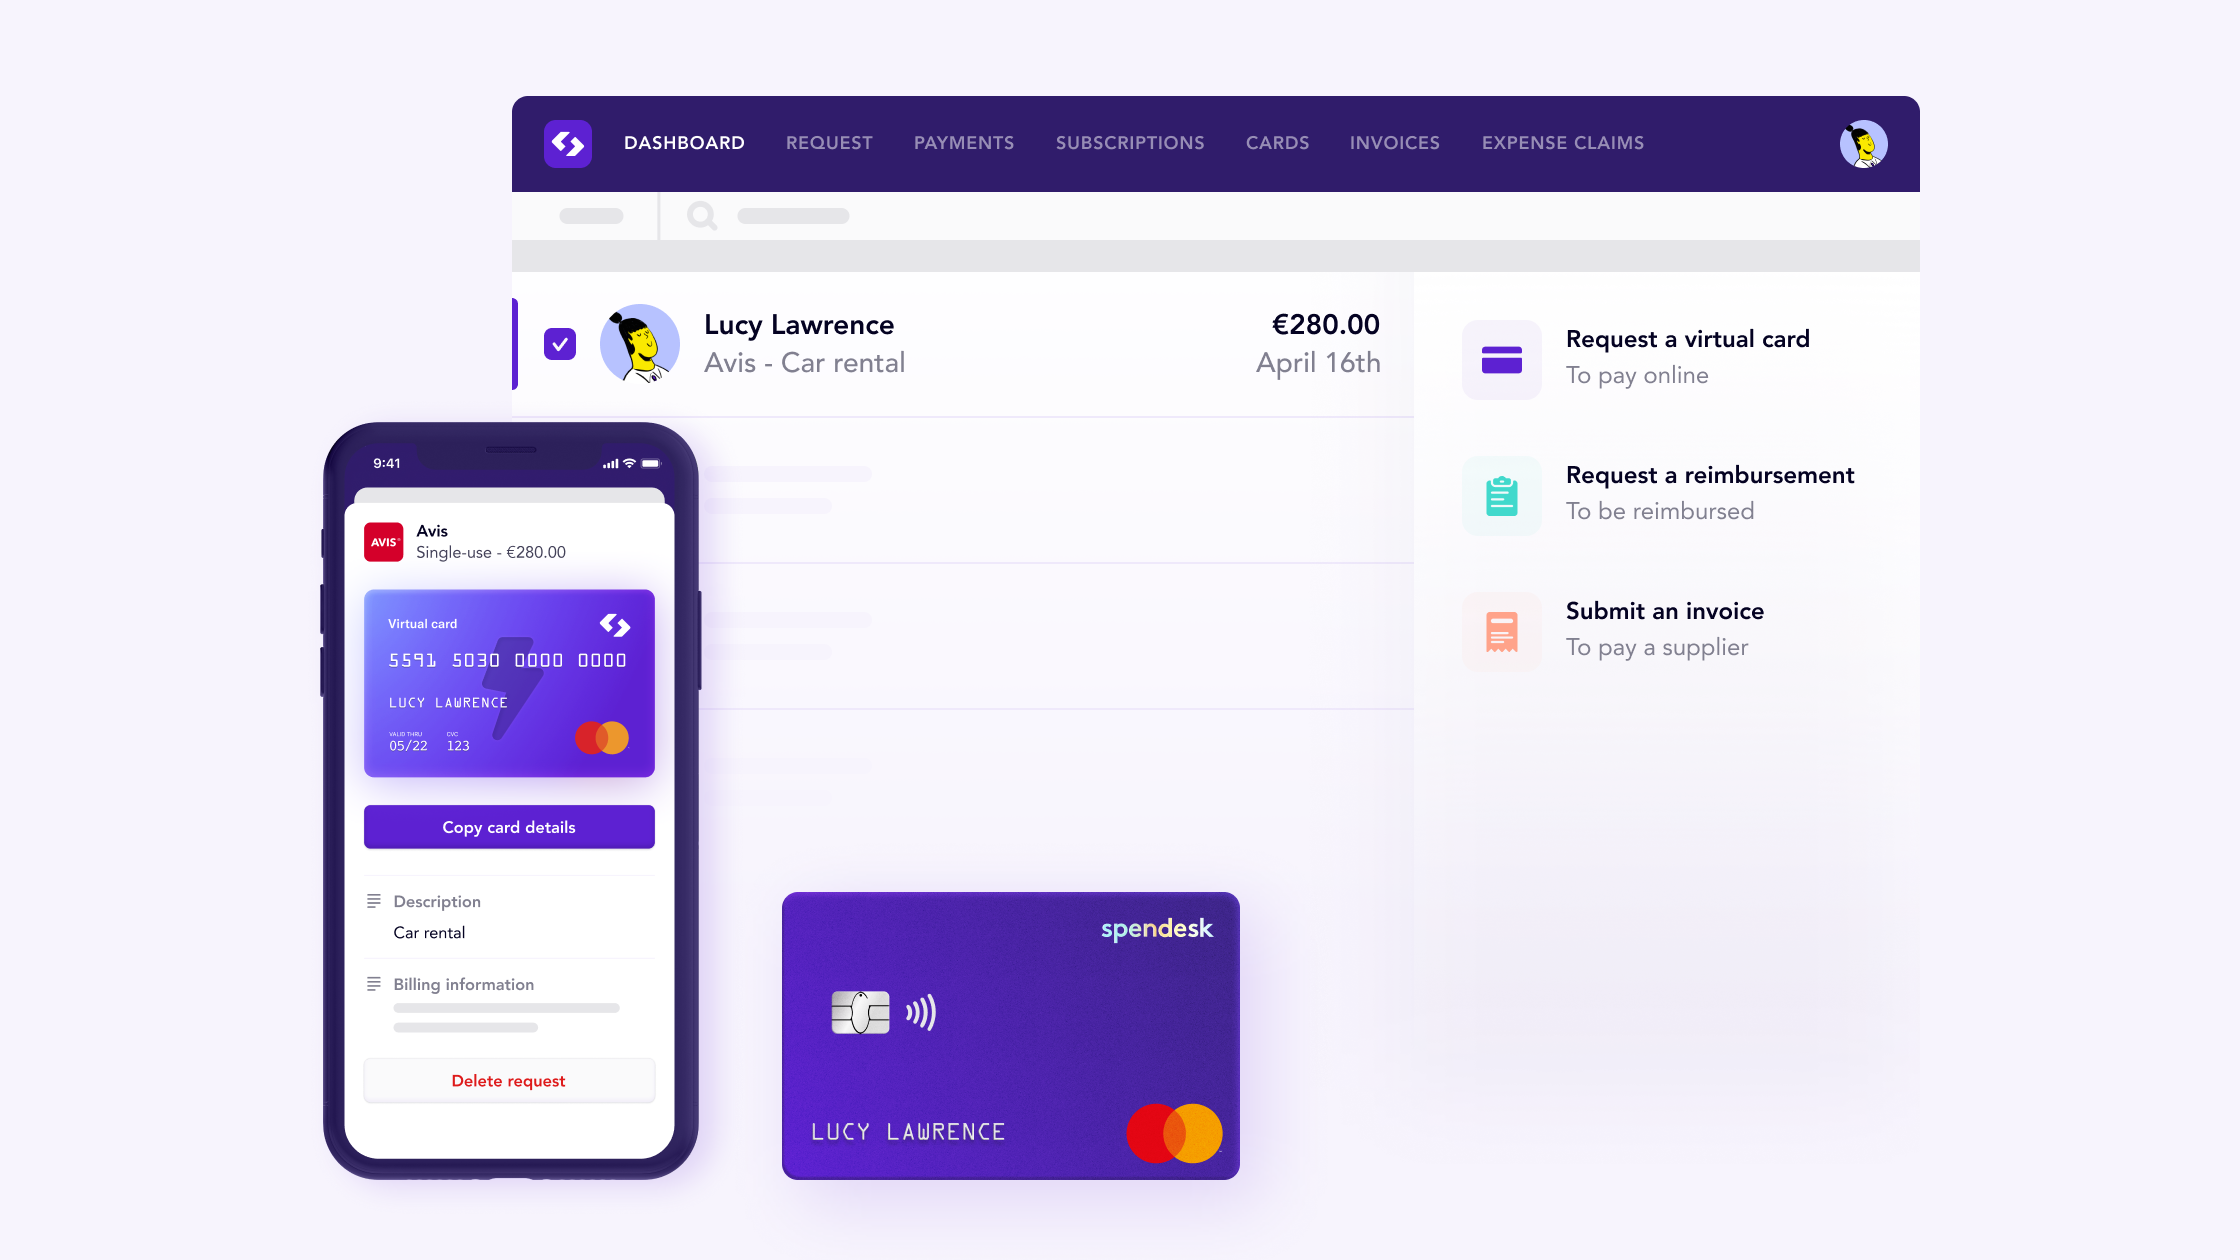 Spendesk Software - Spendesk is an all-in-one spending solution